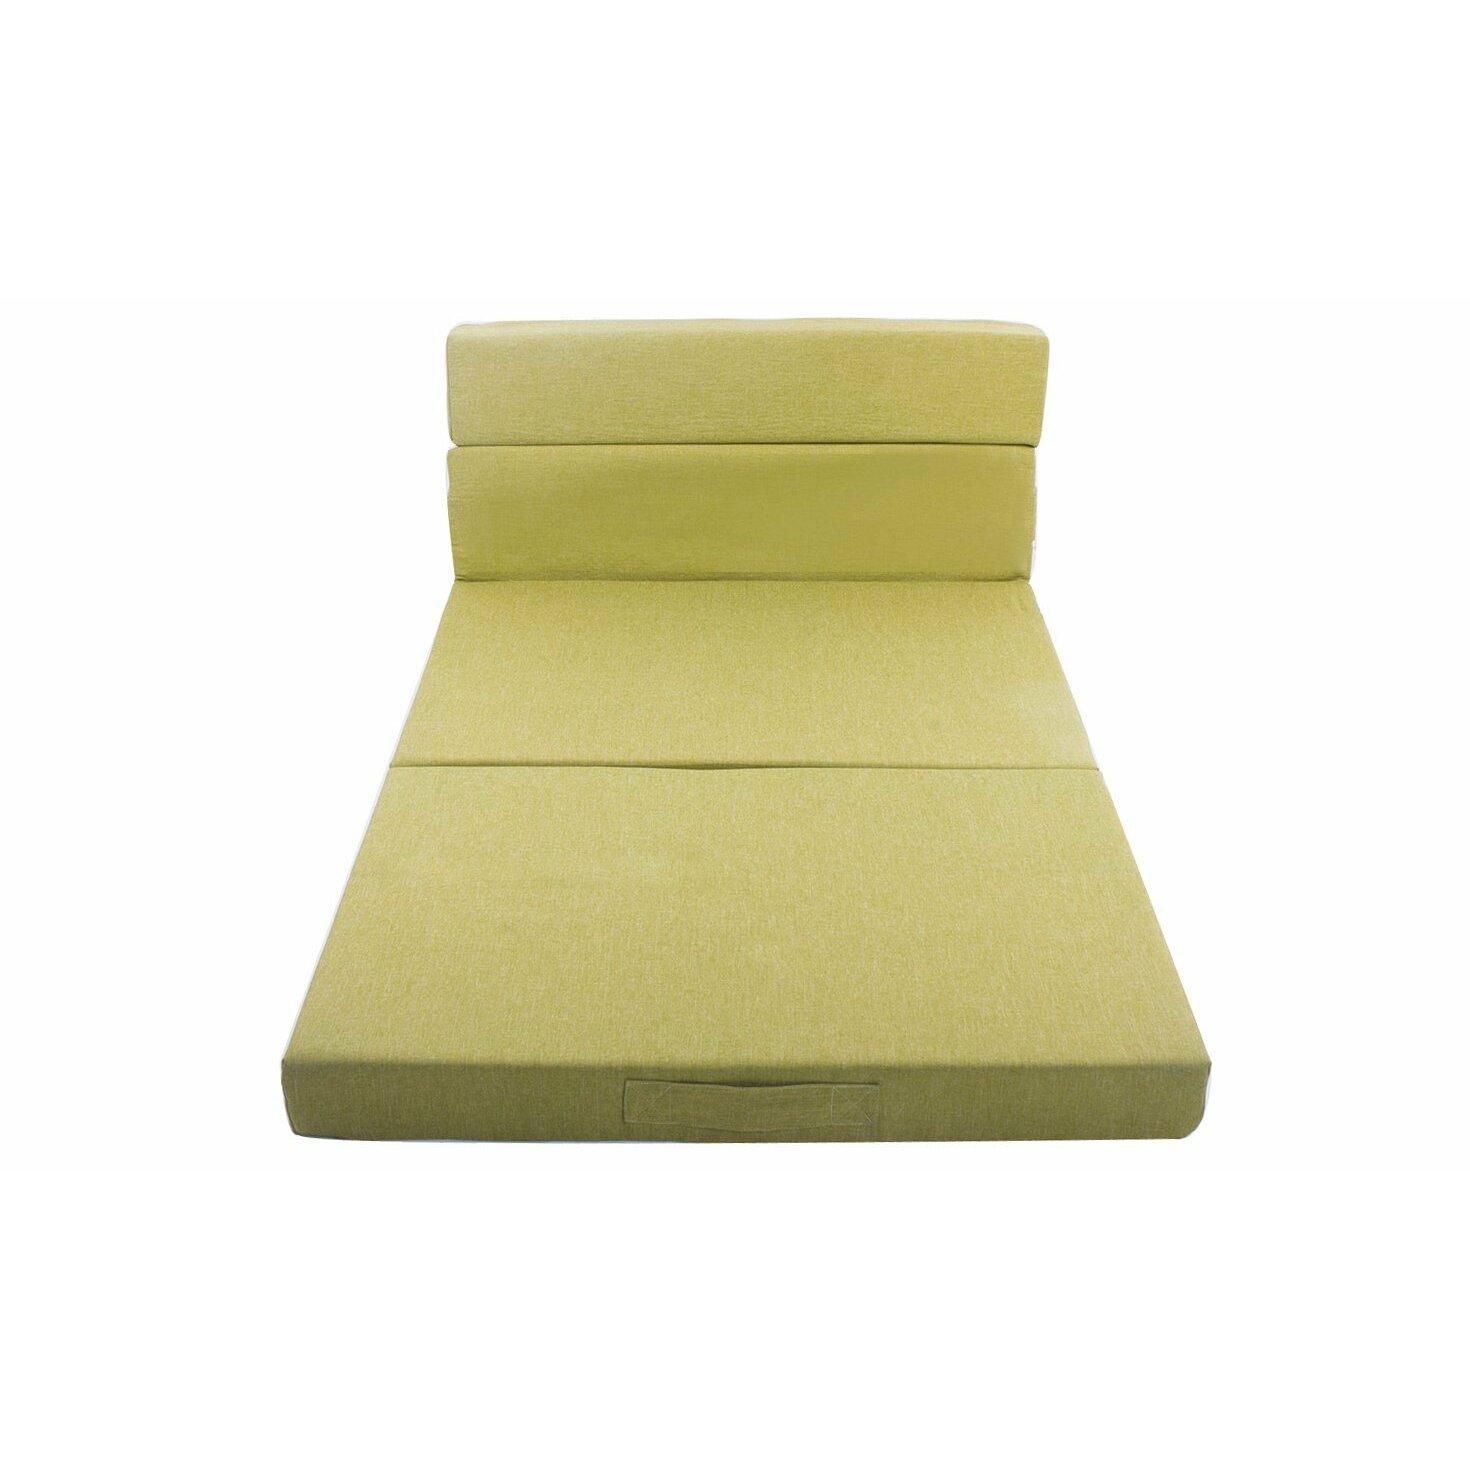 Merax 4 Gel Memory Foam Mattress Wayfair